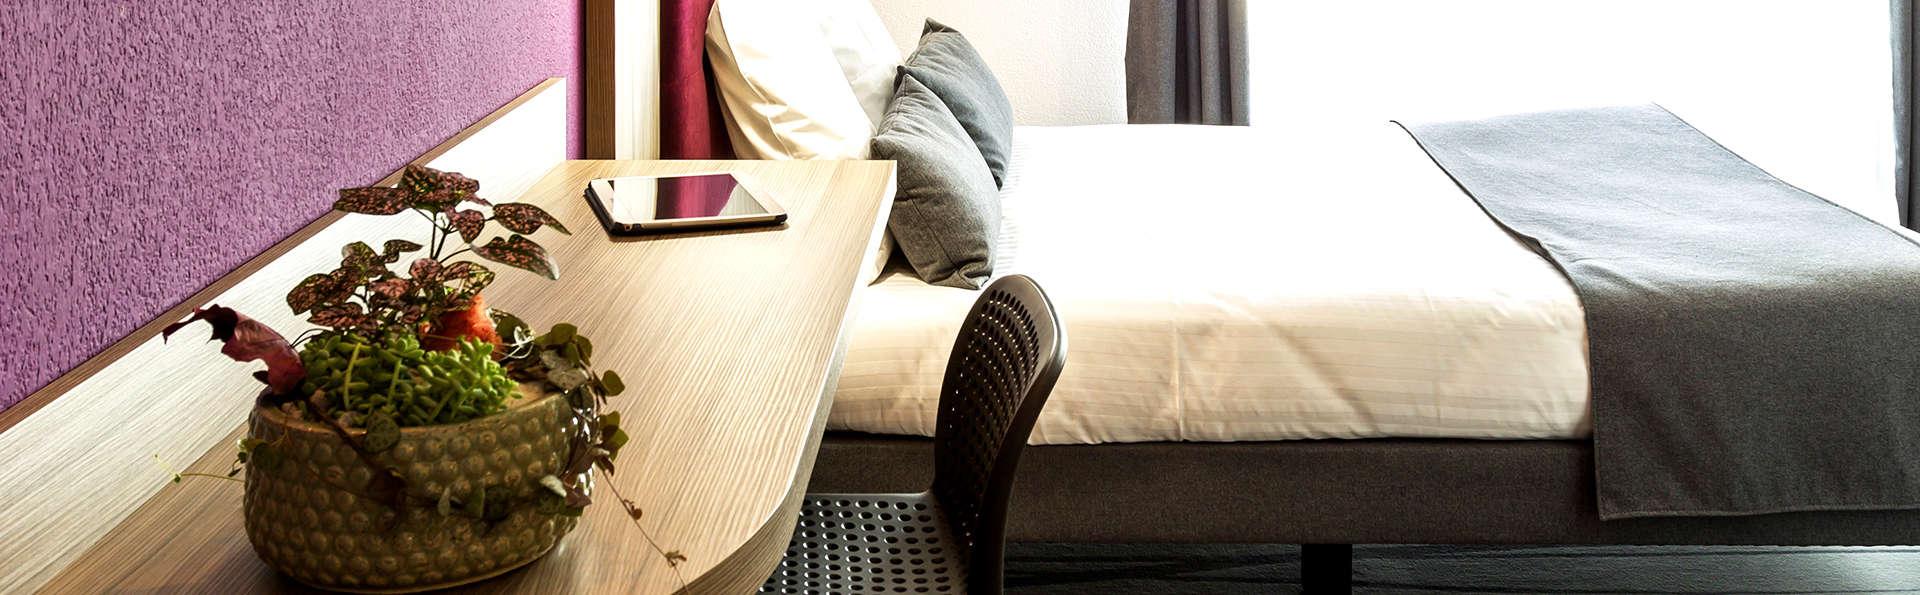 Nemea Appart'hotel Résidence le Stadium - EDIT_NEW_ROOM4.jpg